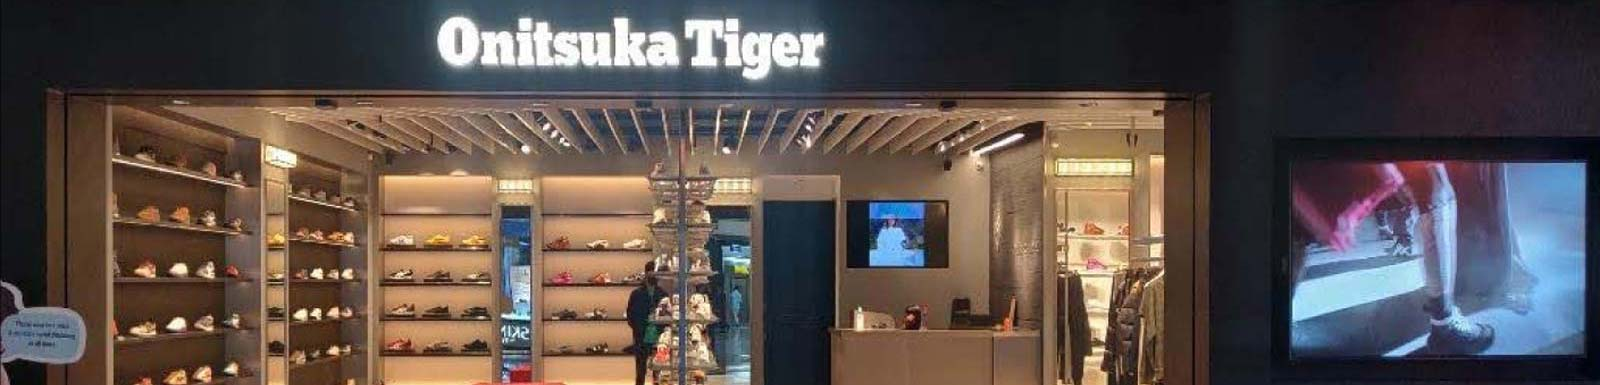 Onitsuka Tigar - Pacific Mall